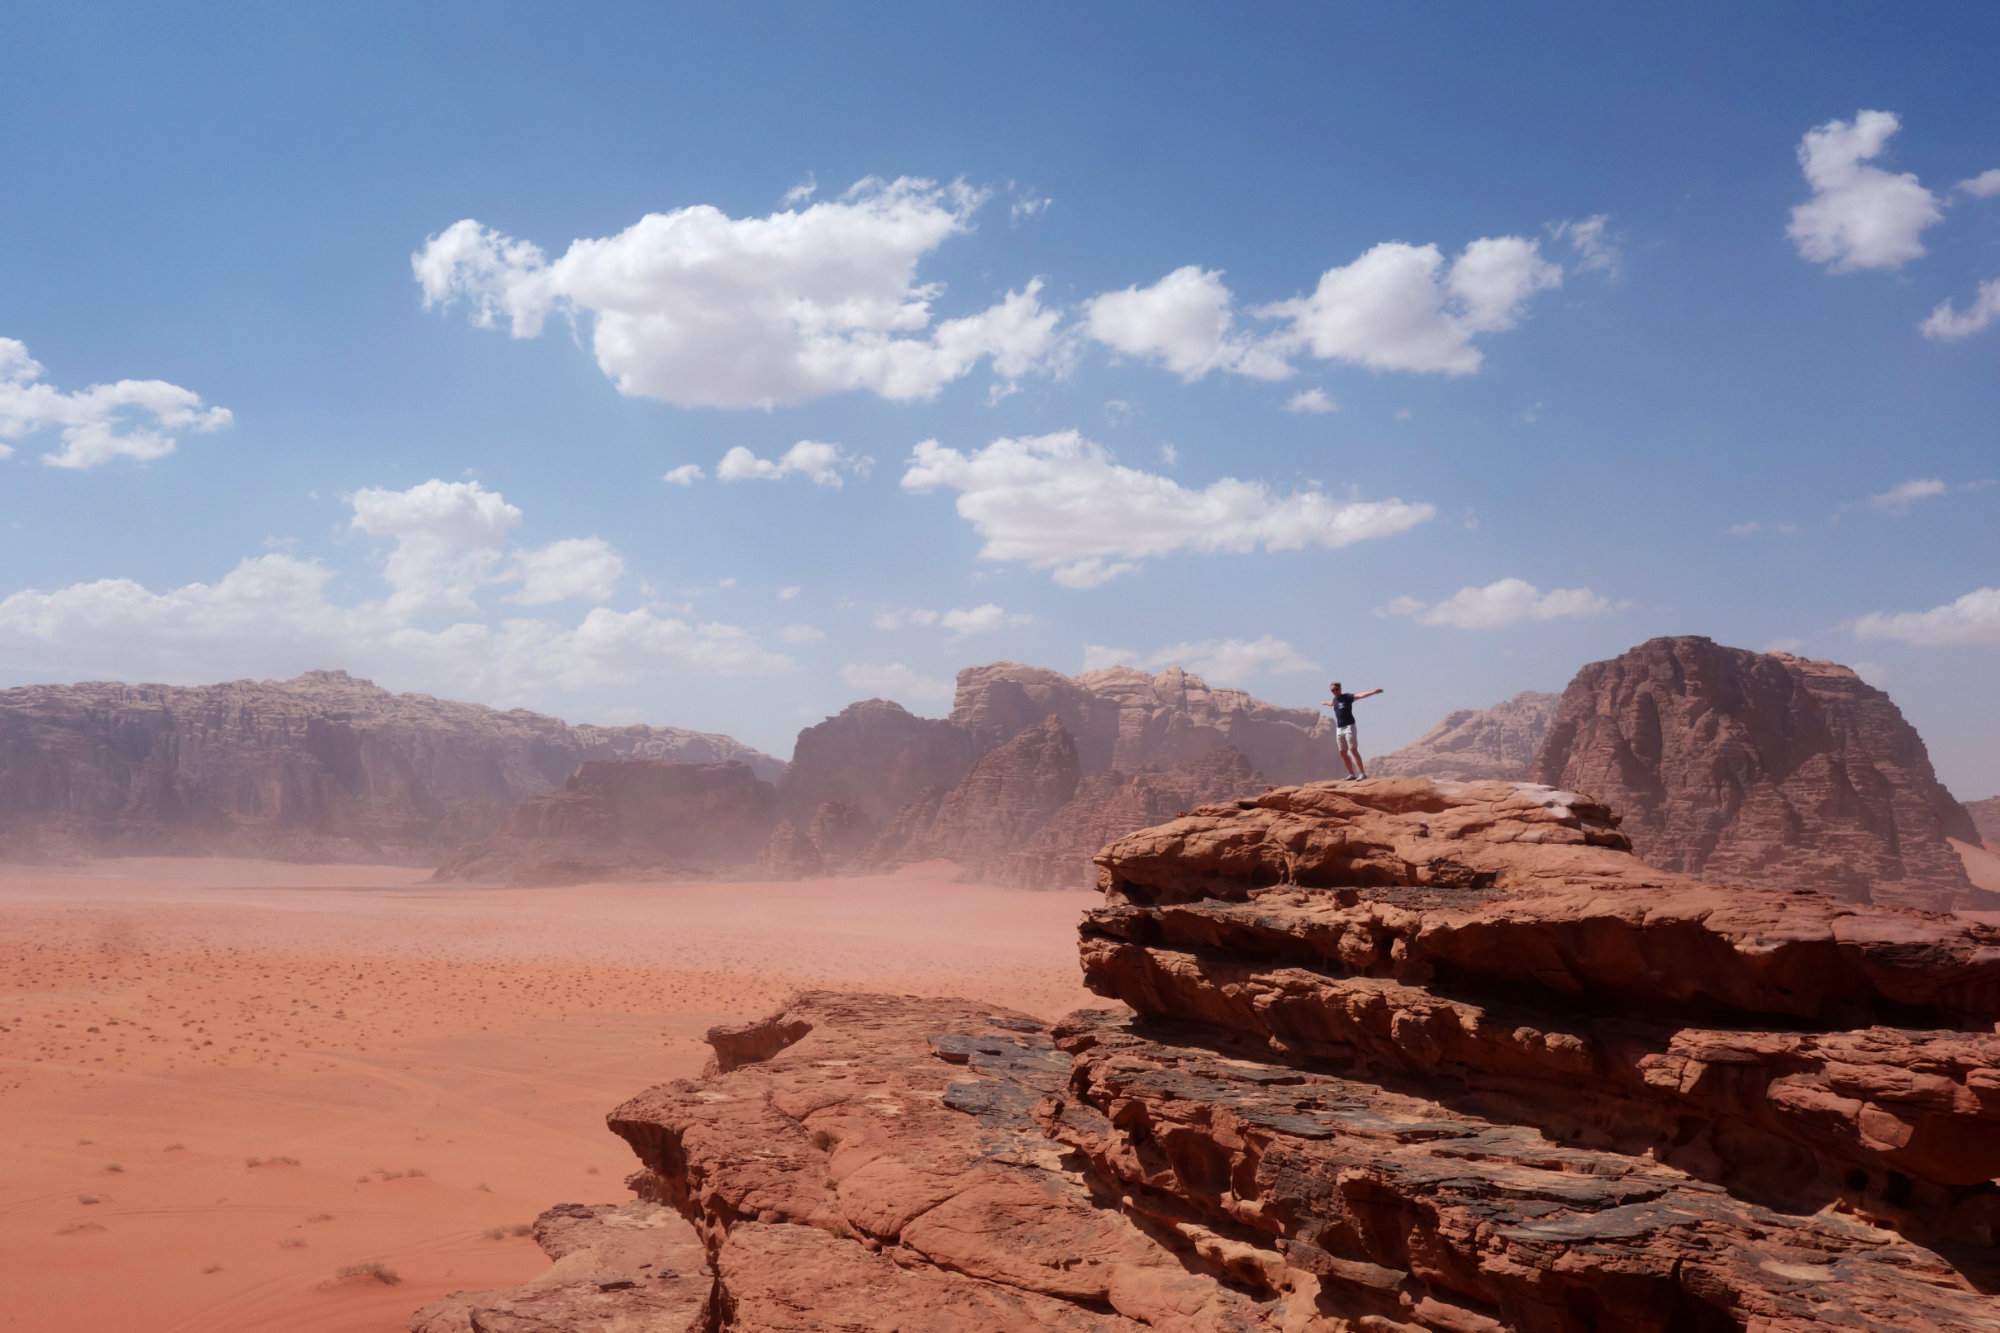 Wadi Rum Matthias Weite